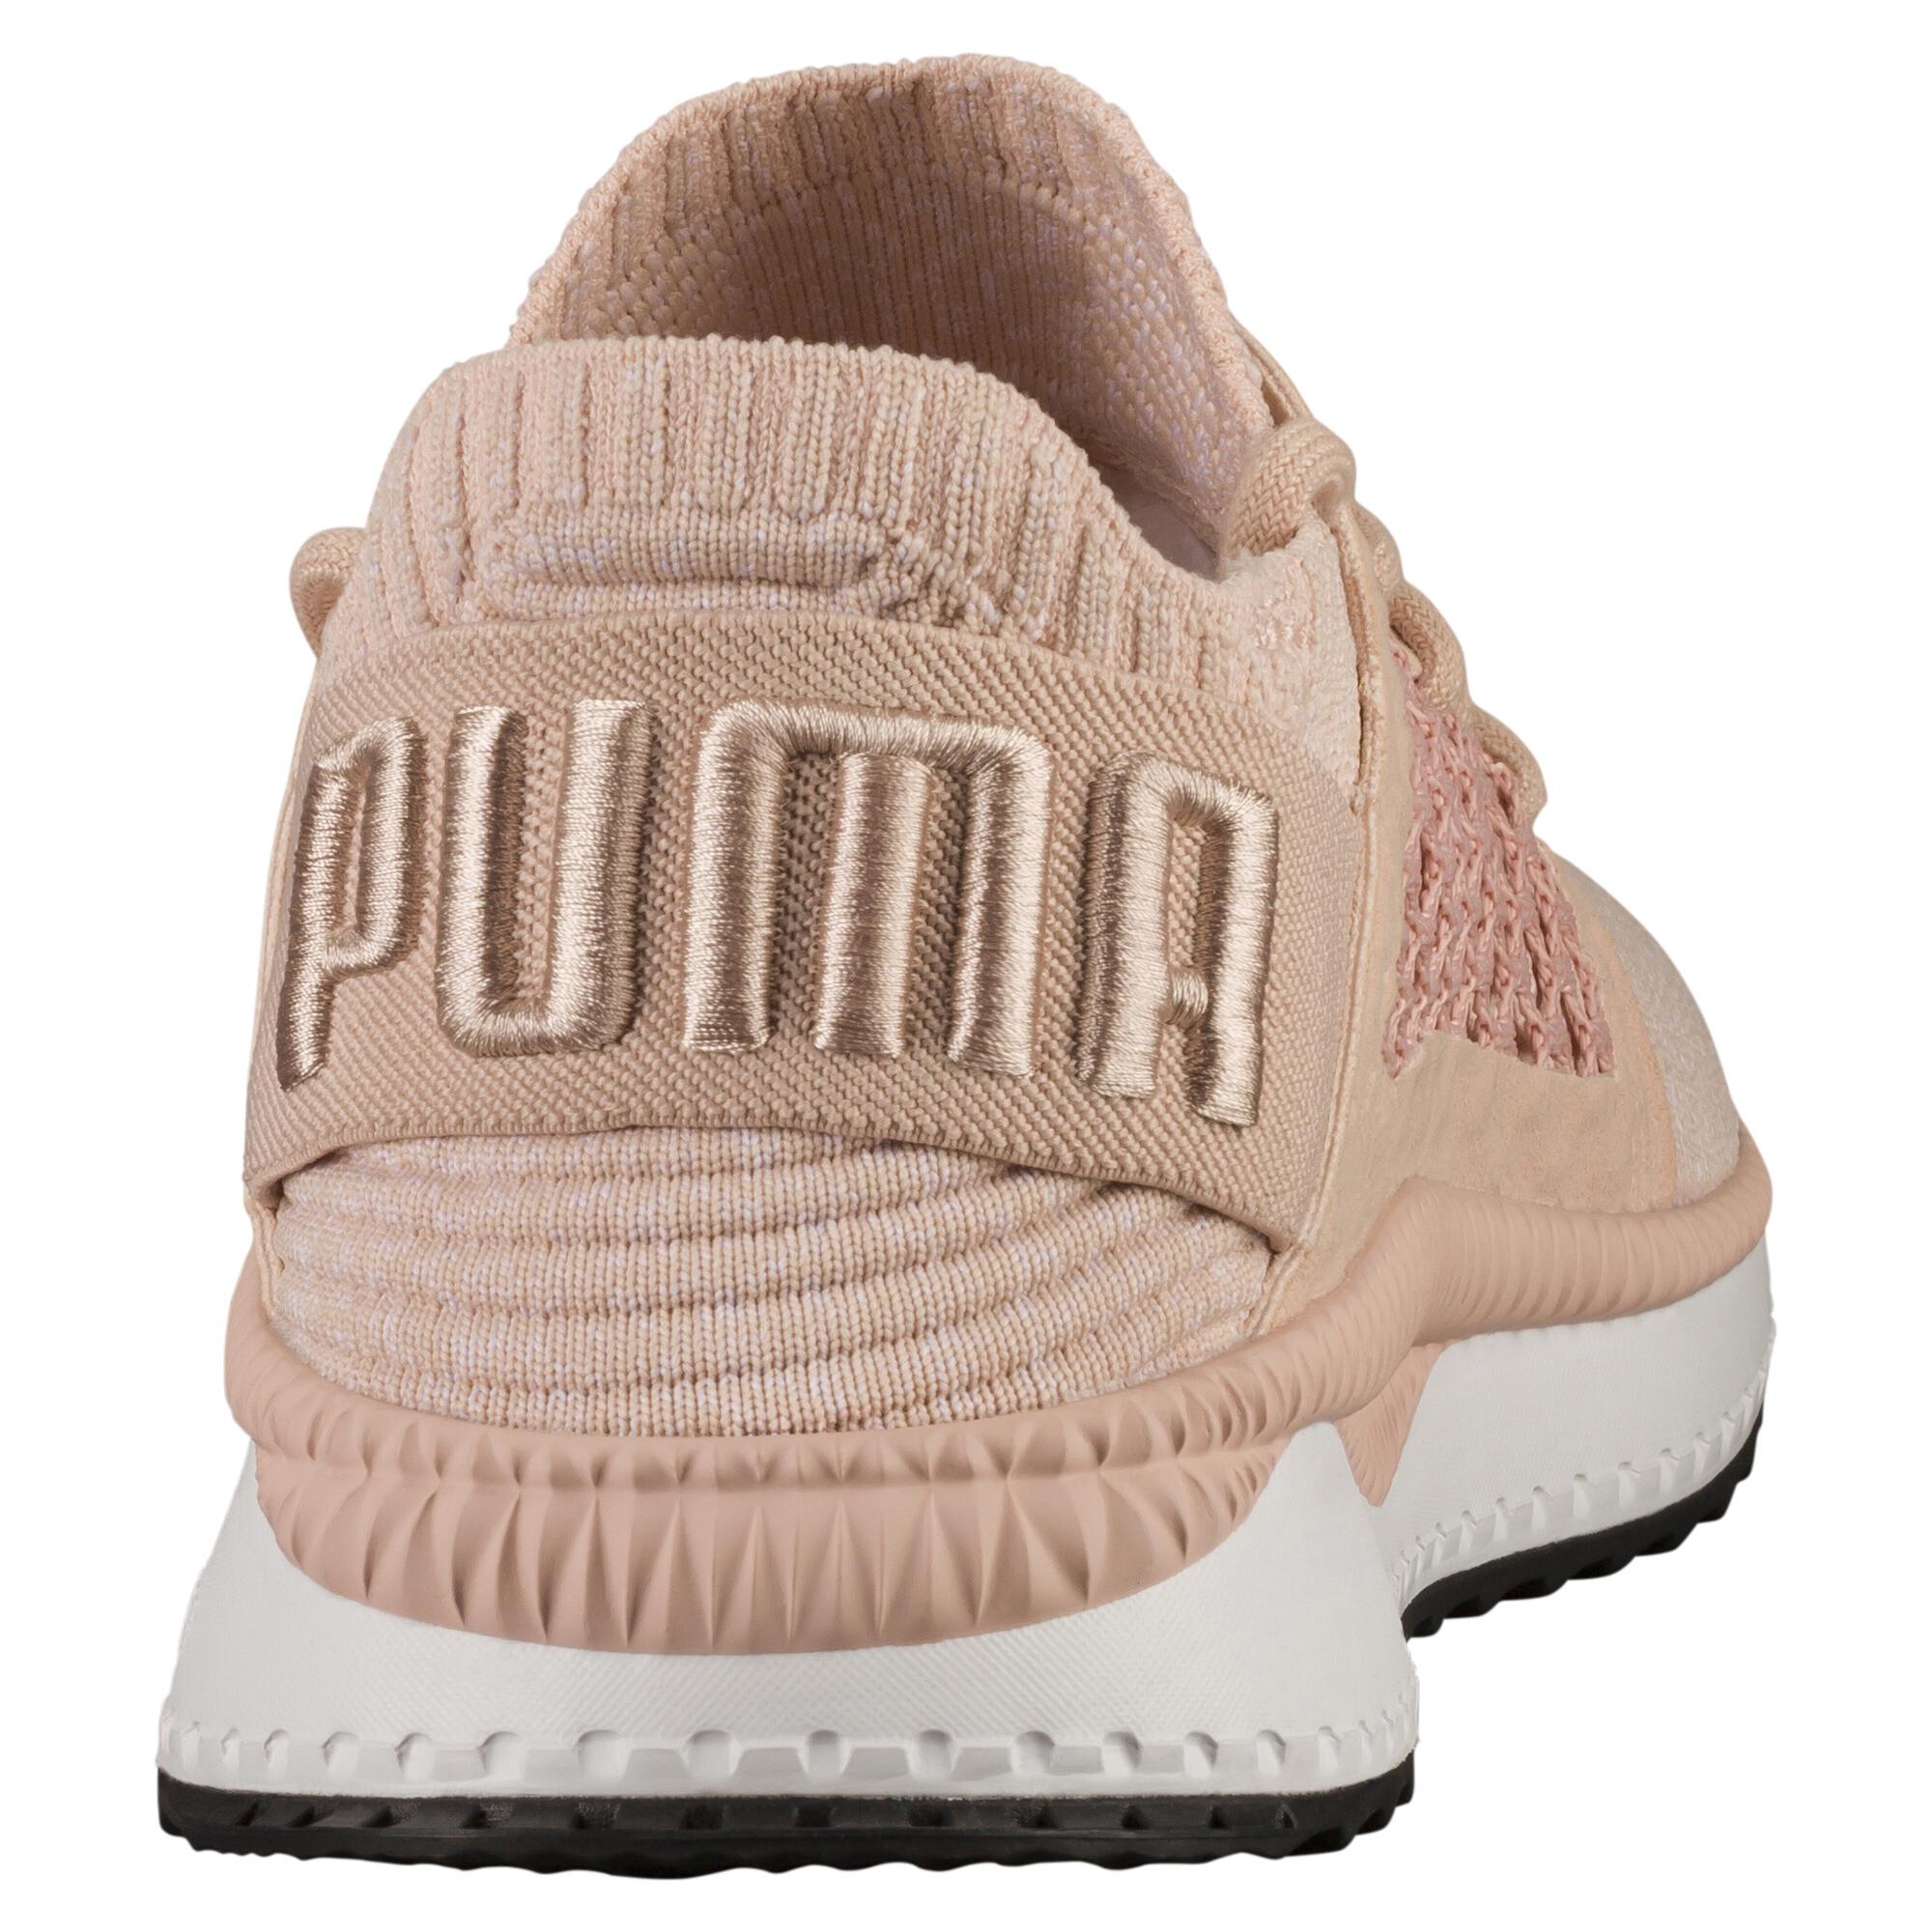 PUMA-TSUGI-NETFIT-evoKNIT-Sneaker-Frauen-Schuhe-Neu Indexbild 15